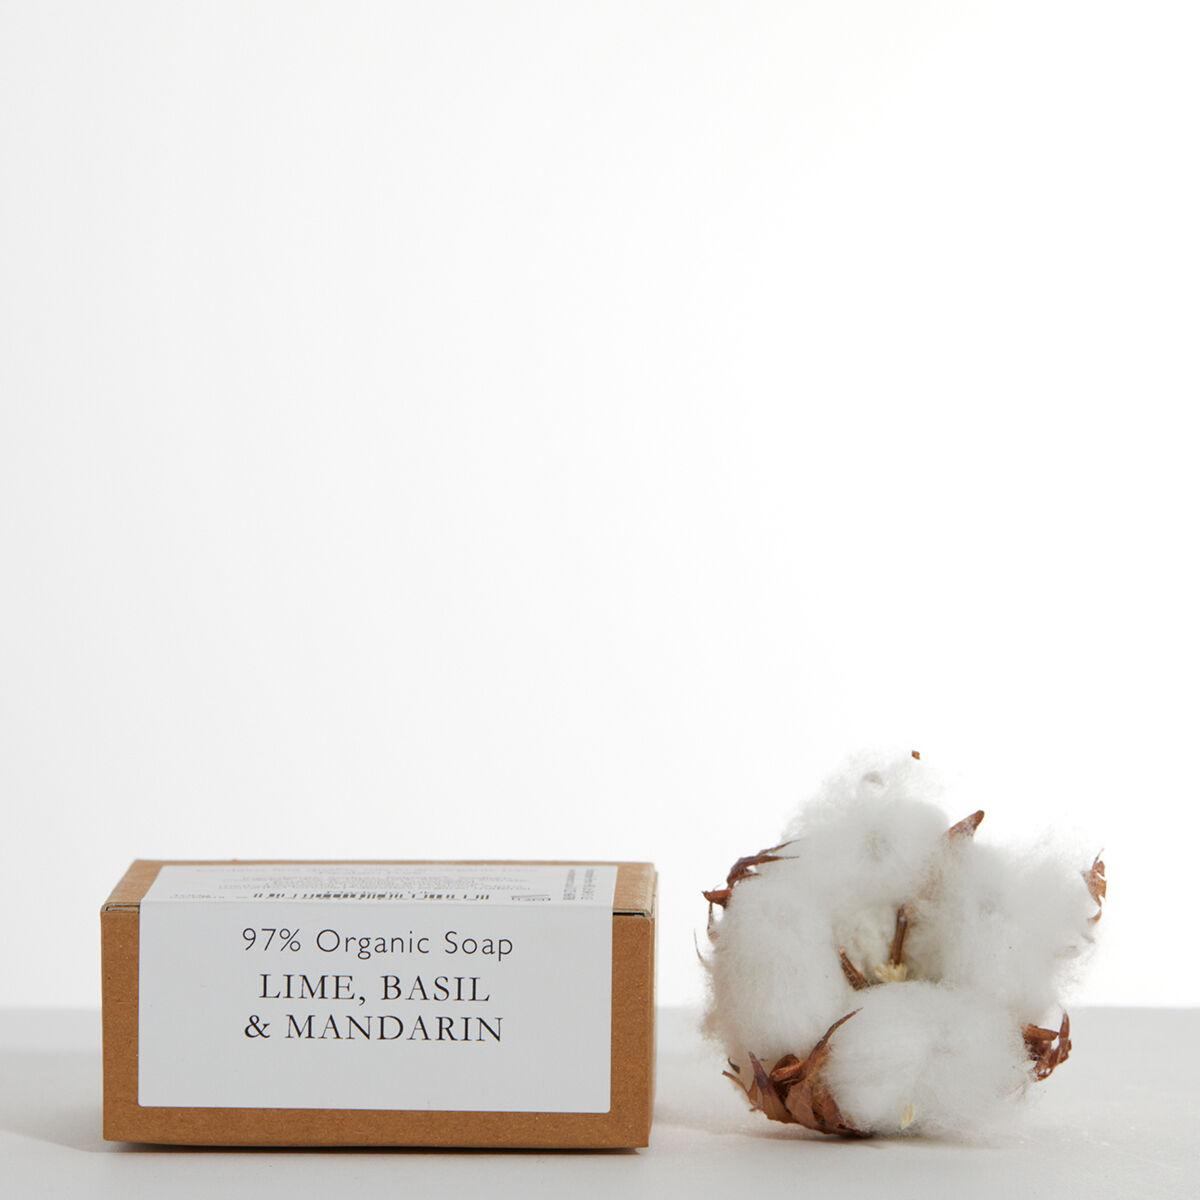 Organic Soap in Kraft Paper